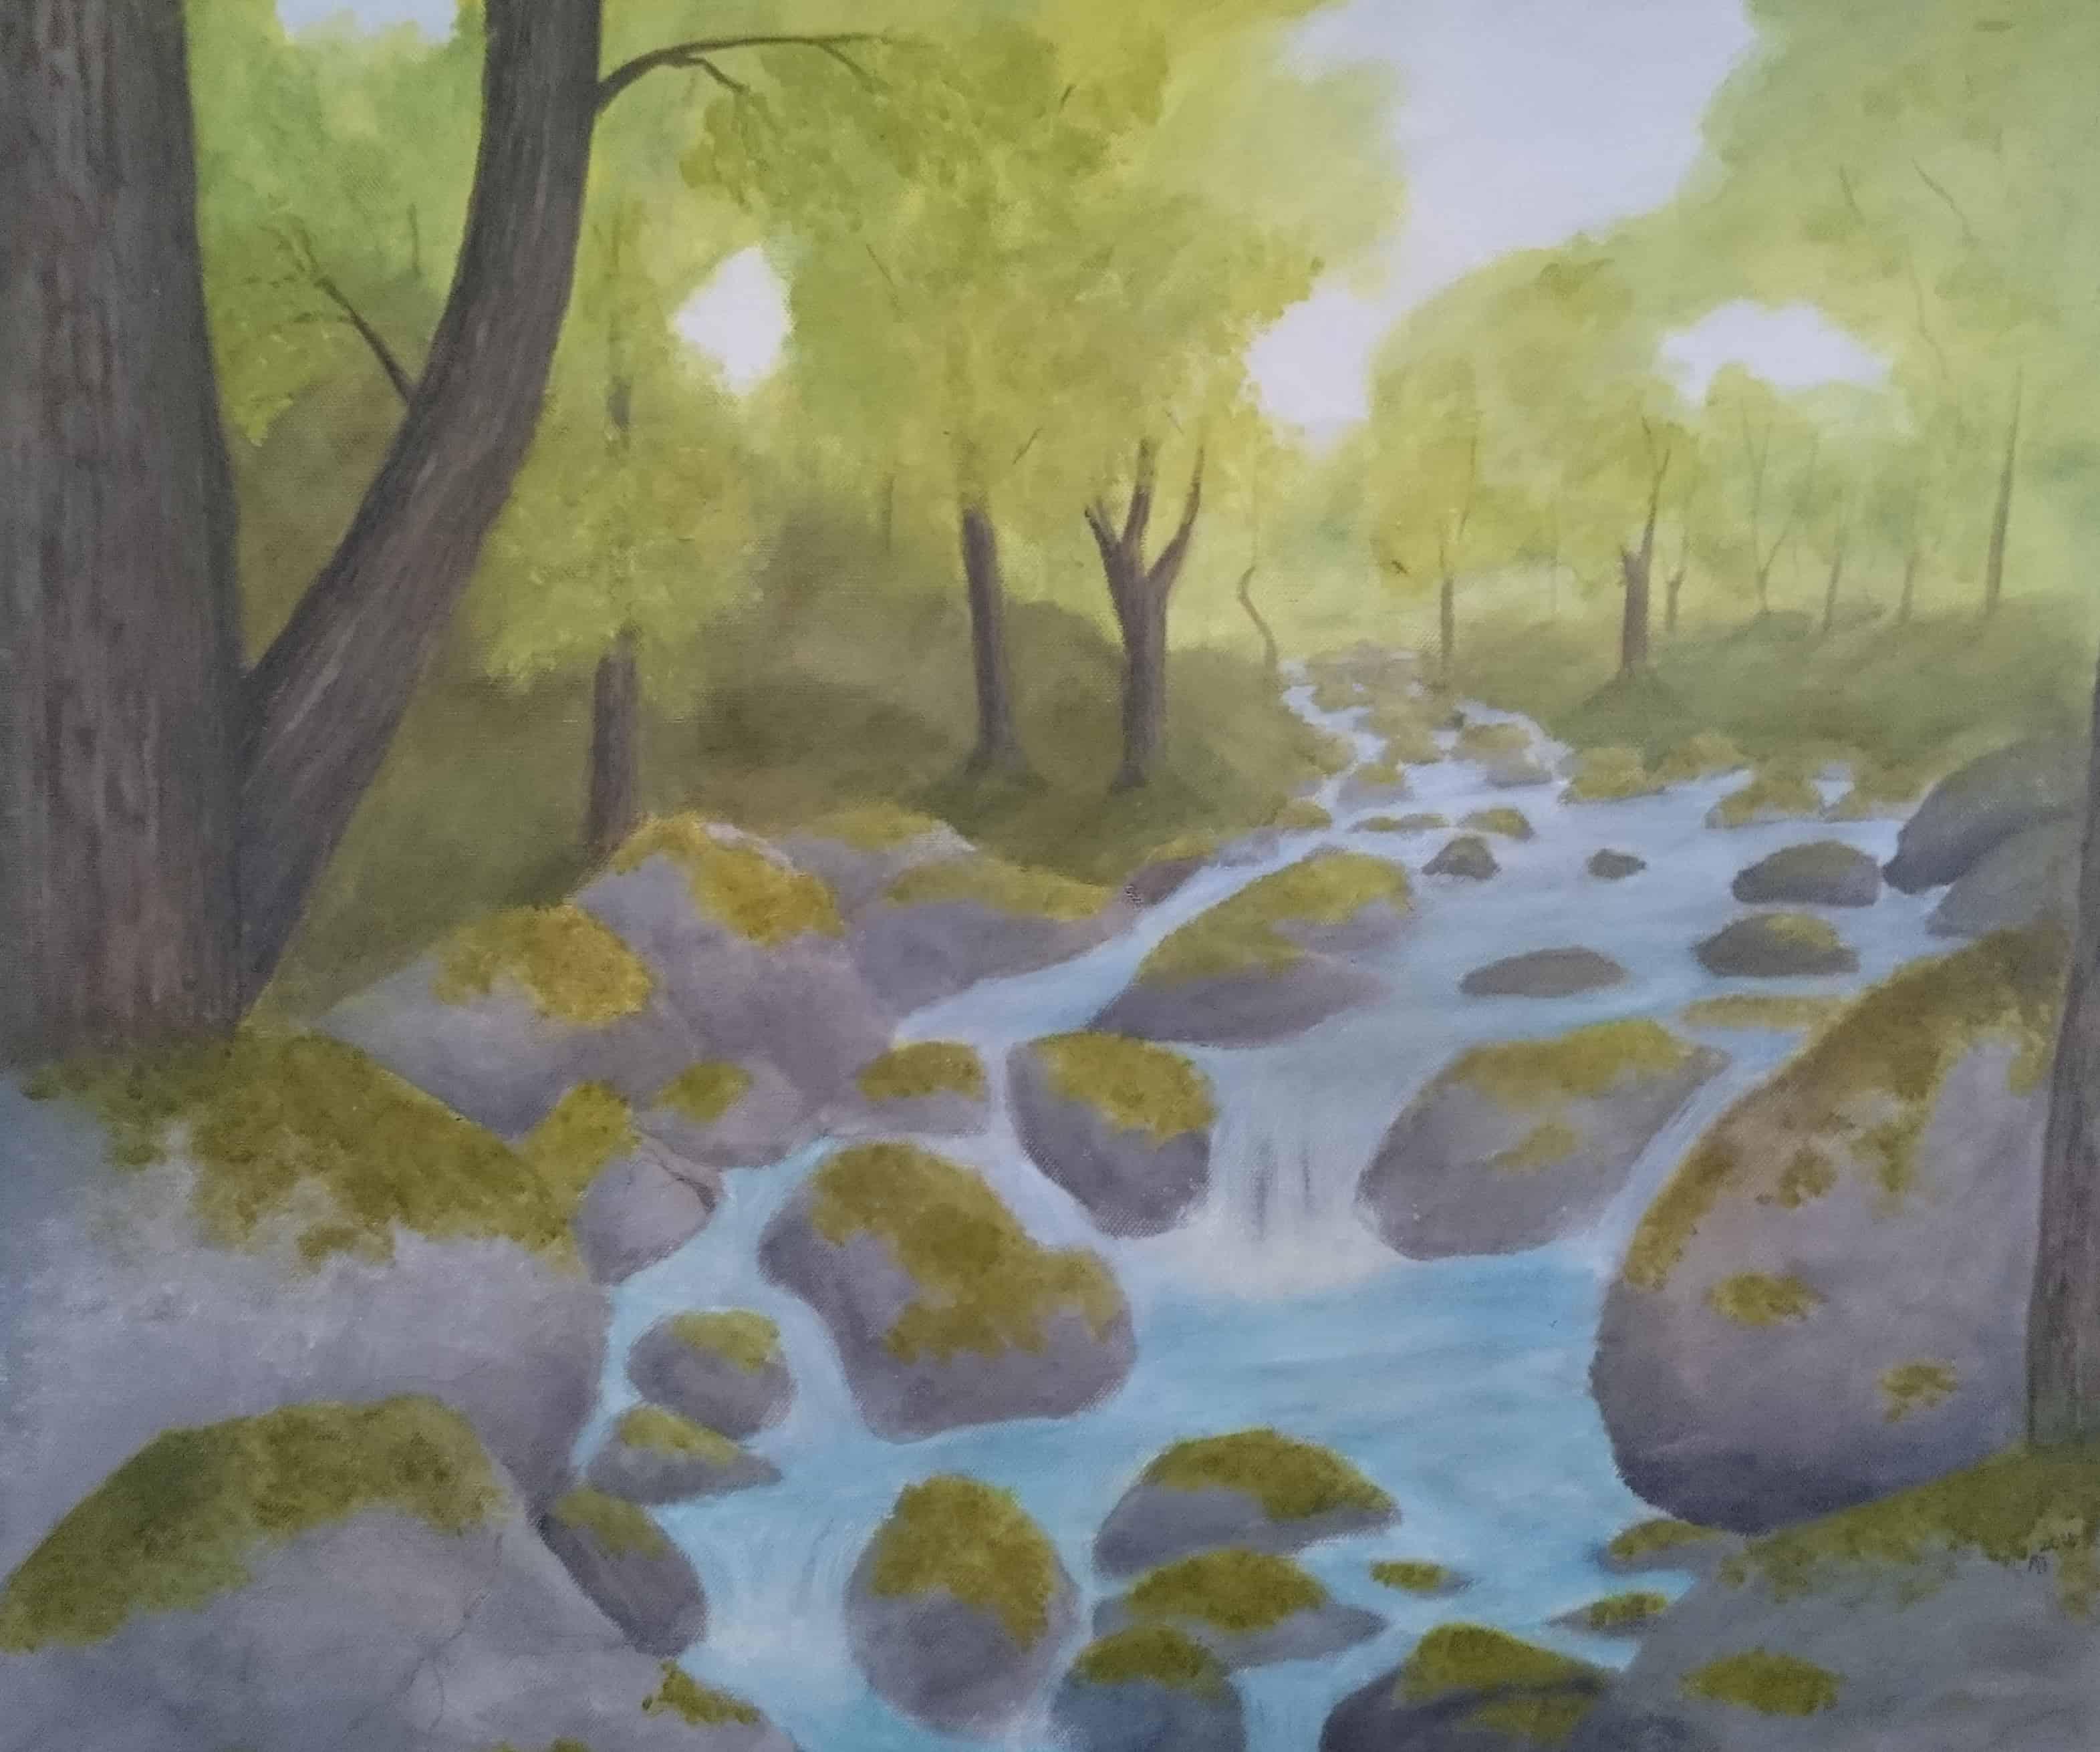 Presenting a mythological landscape that will change